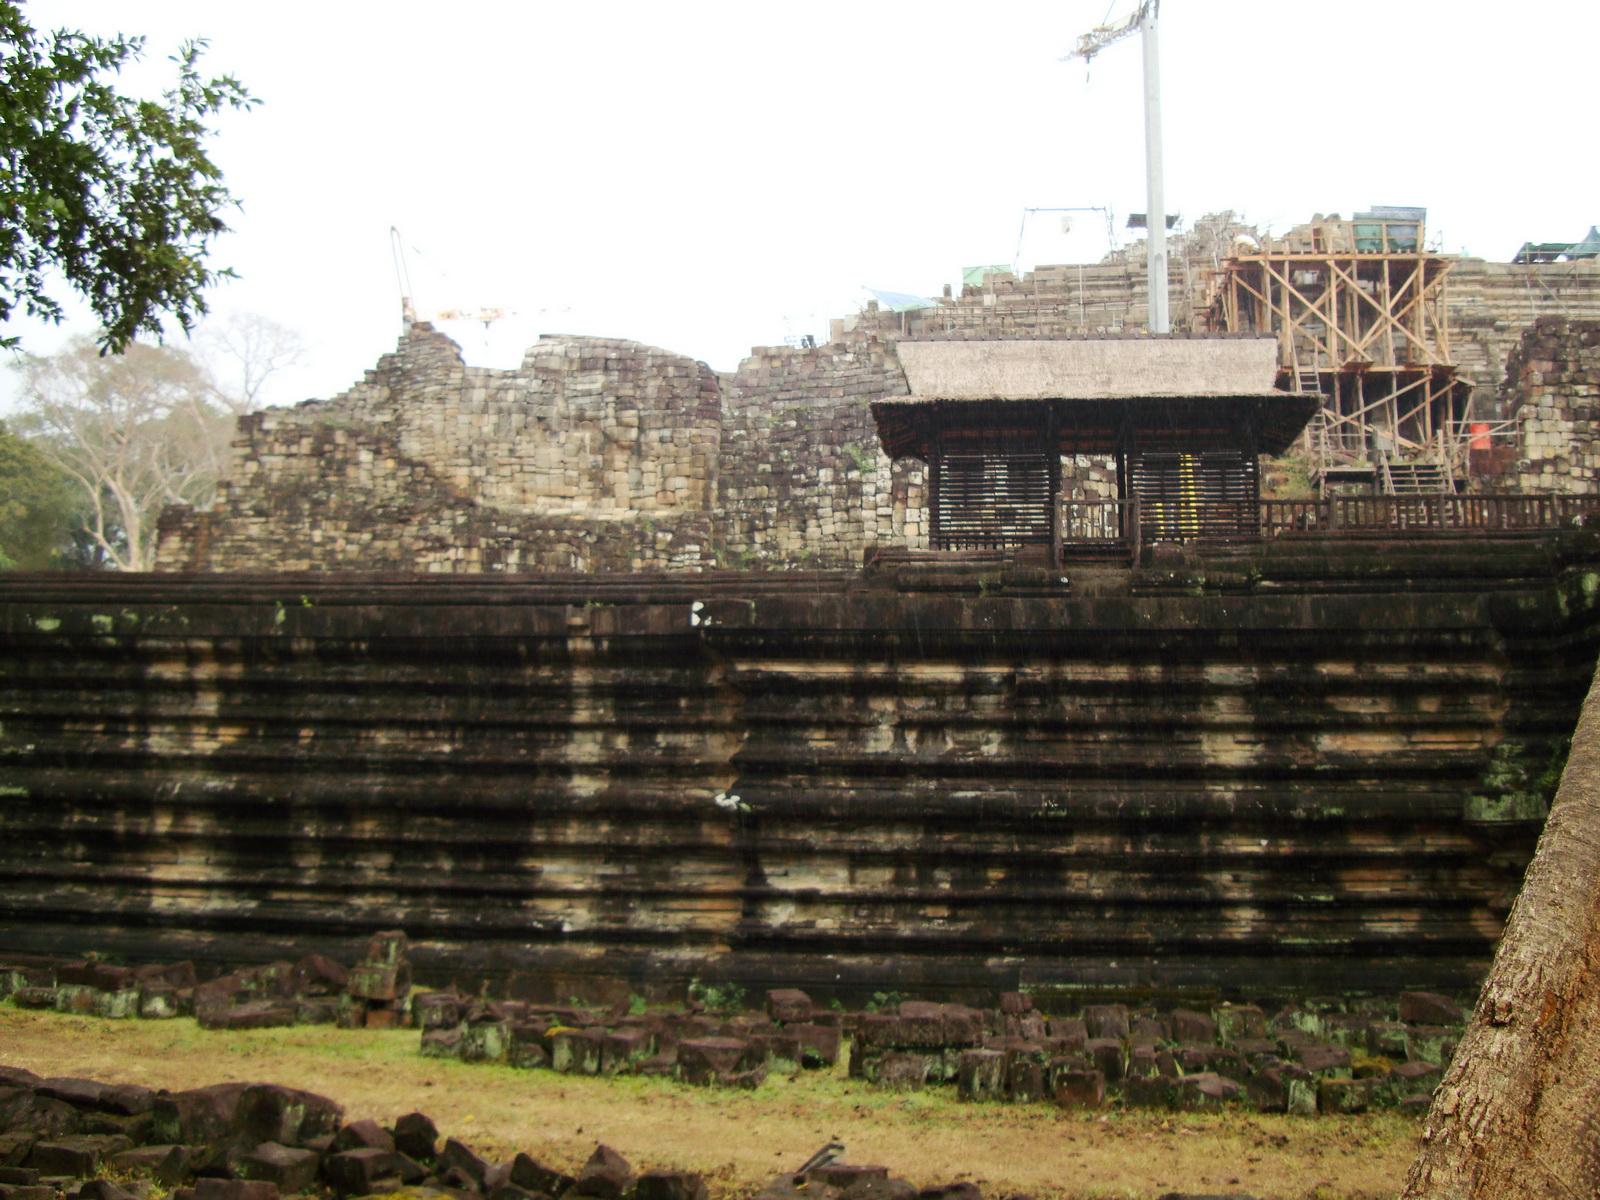 Baphuon temple Khmer style mid 11th century Angkor 05